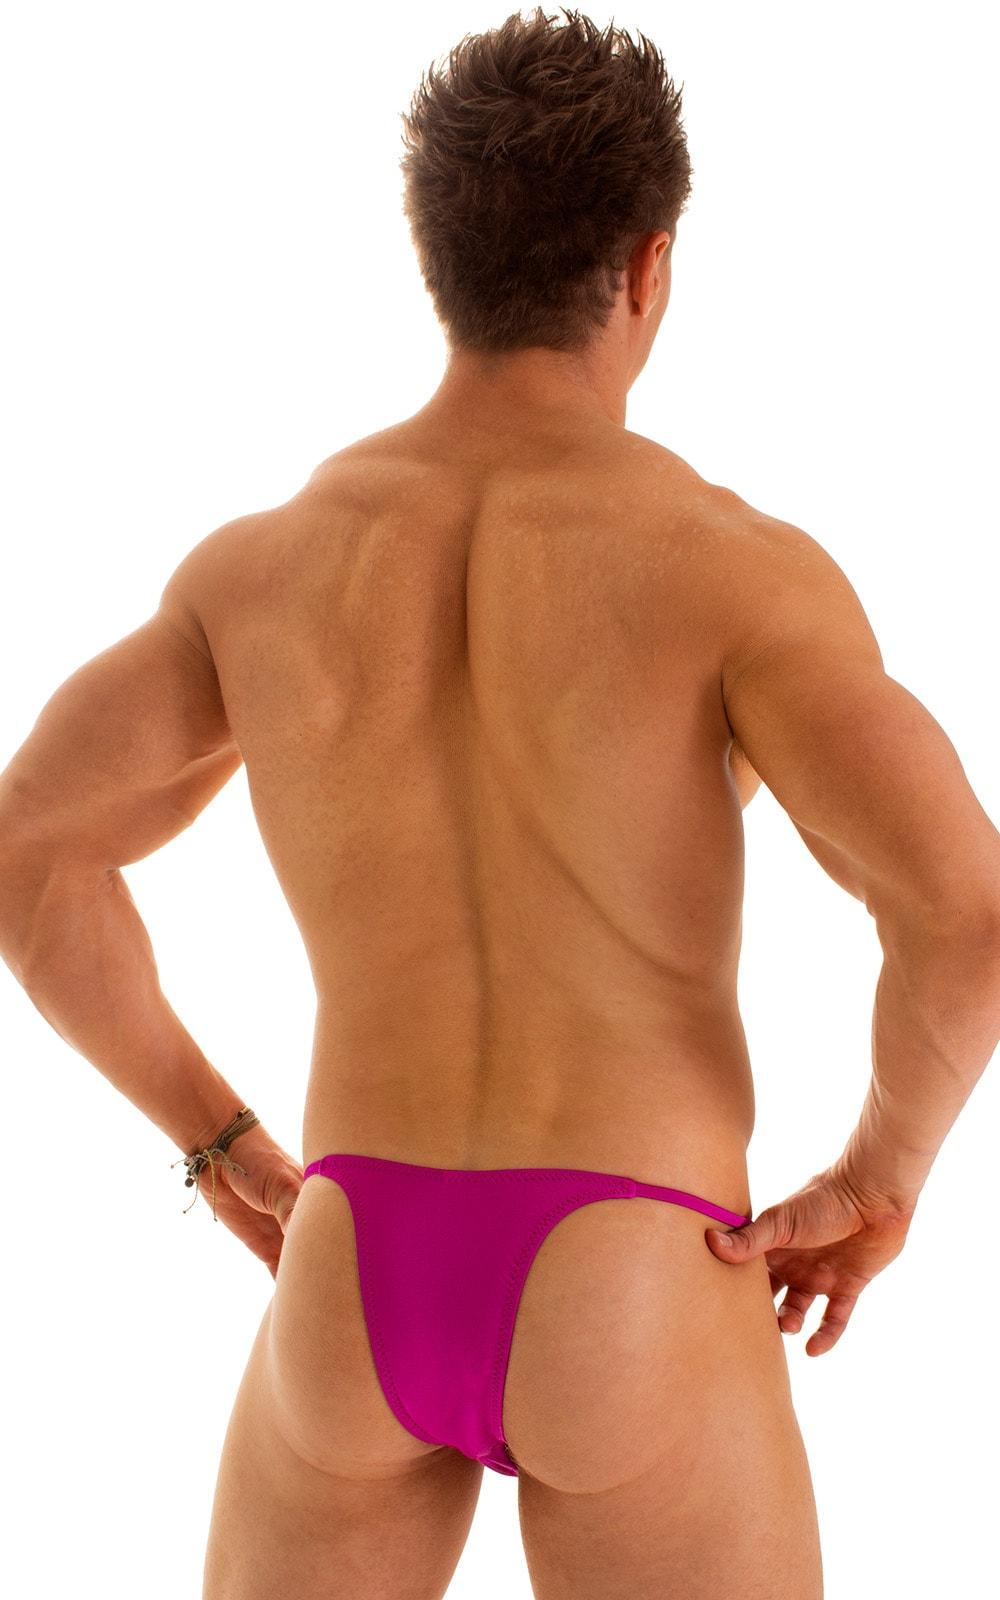 Sunseeker2 Tanning Swimsuit in Magenta 2